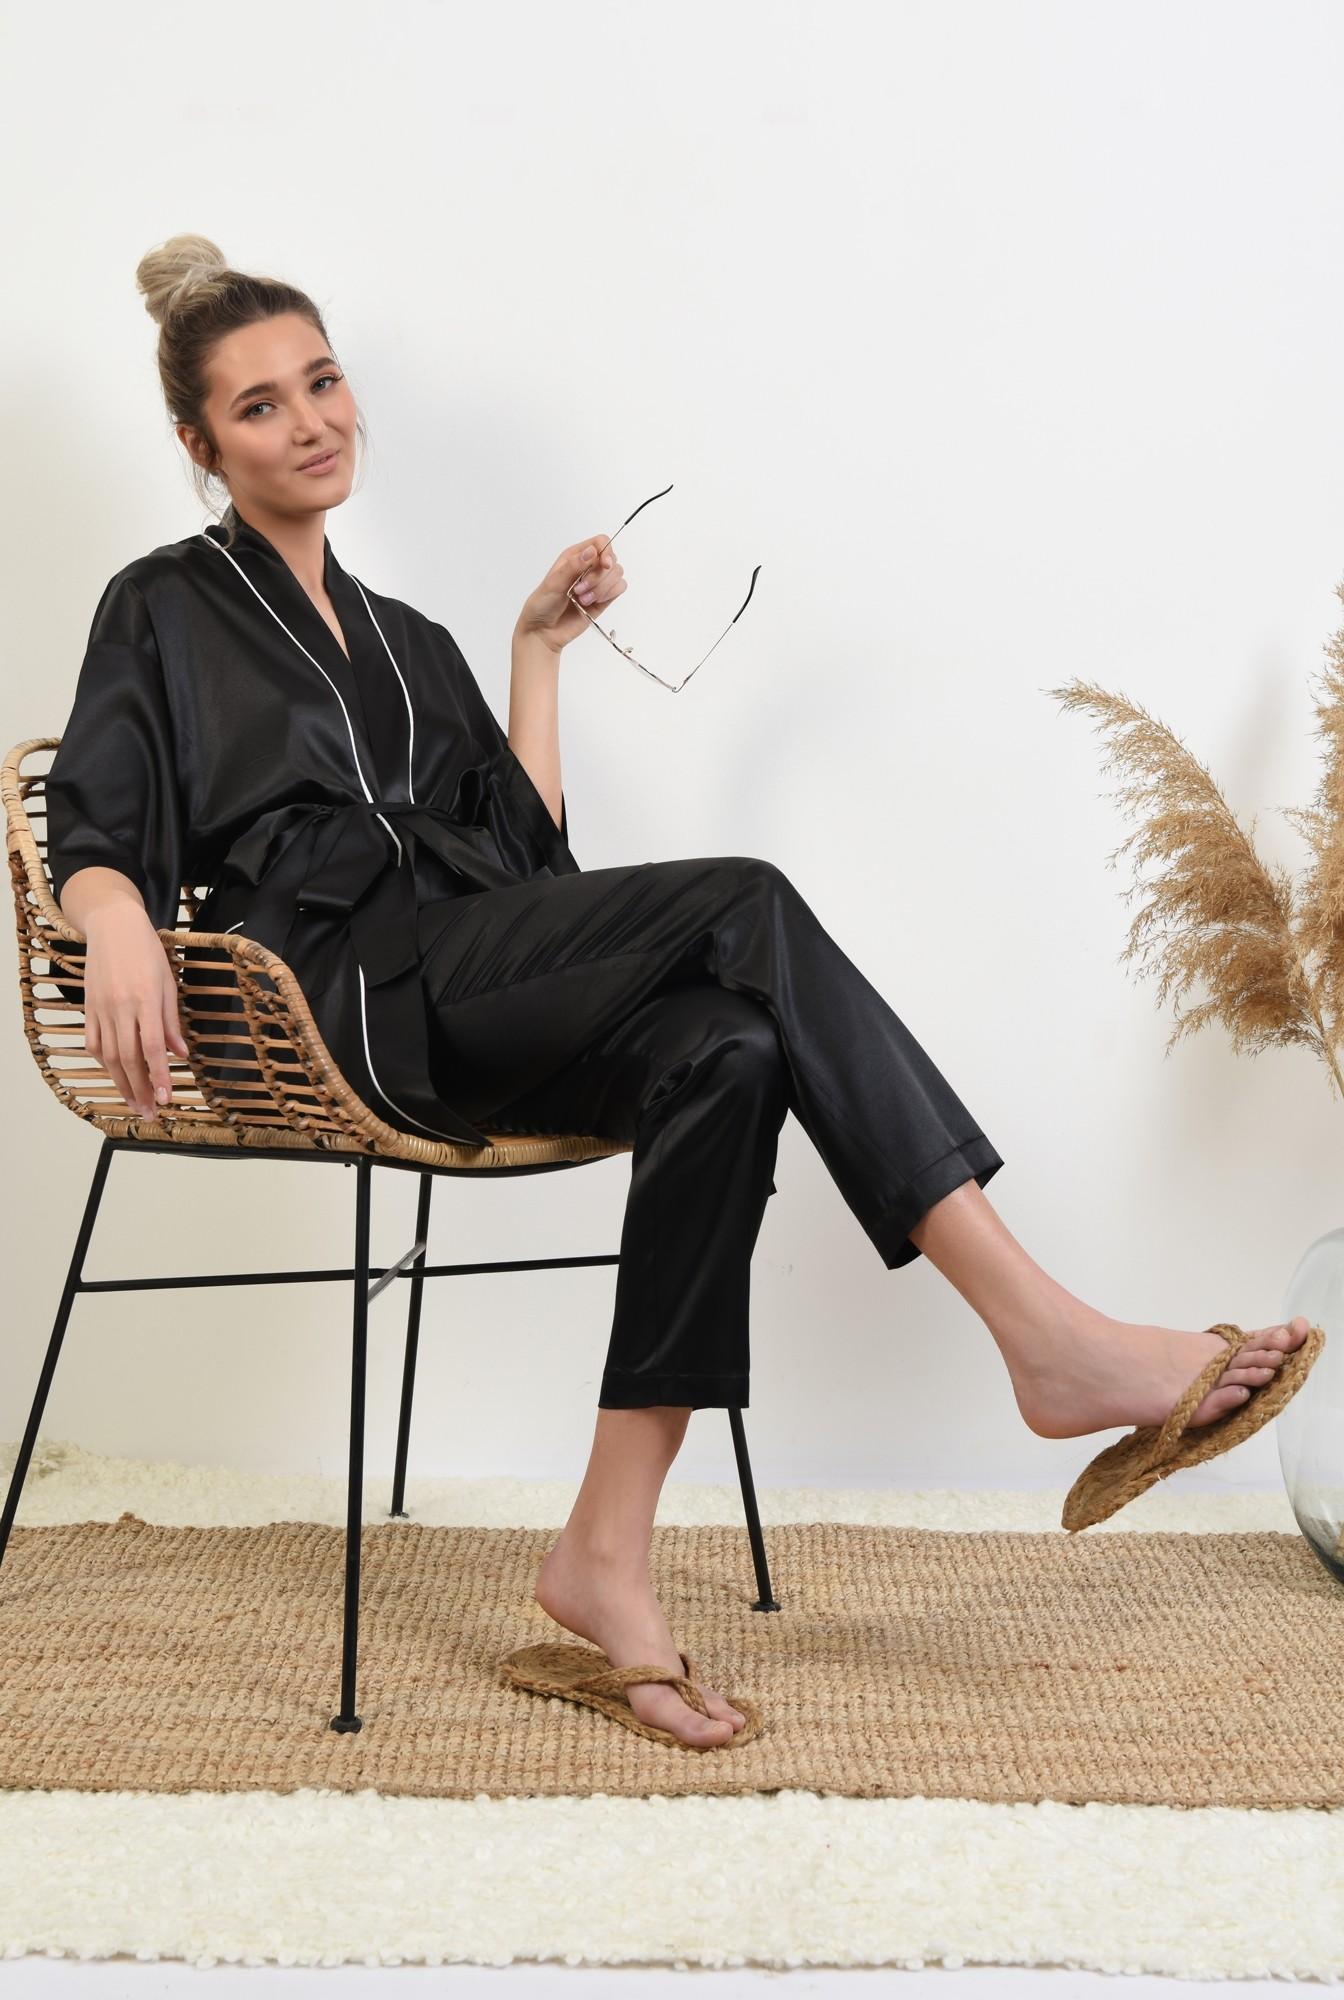 0 - 360 - pantaloni din satin, negri, lungi, cu funda in contrast